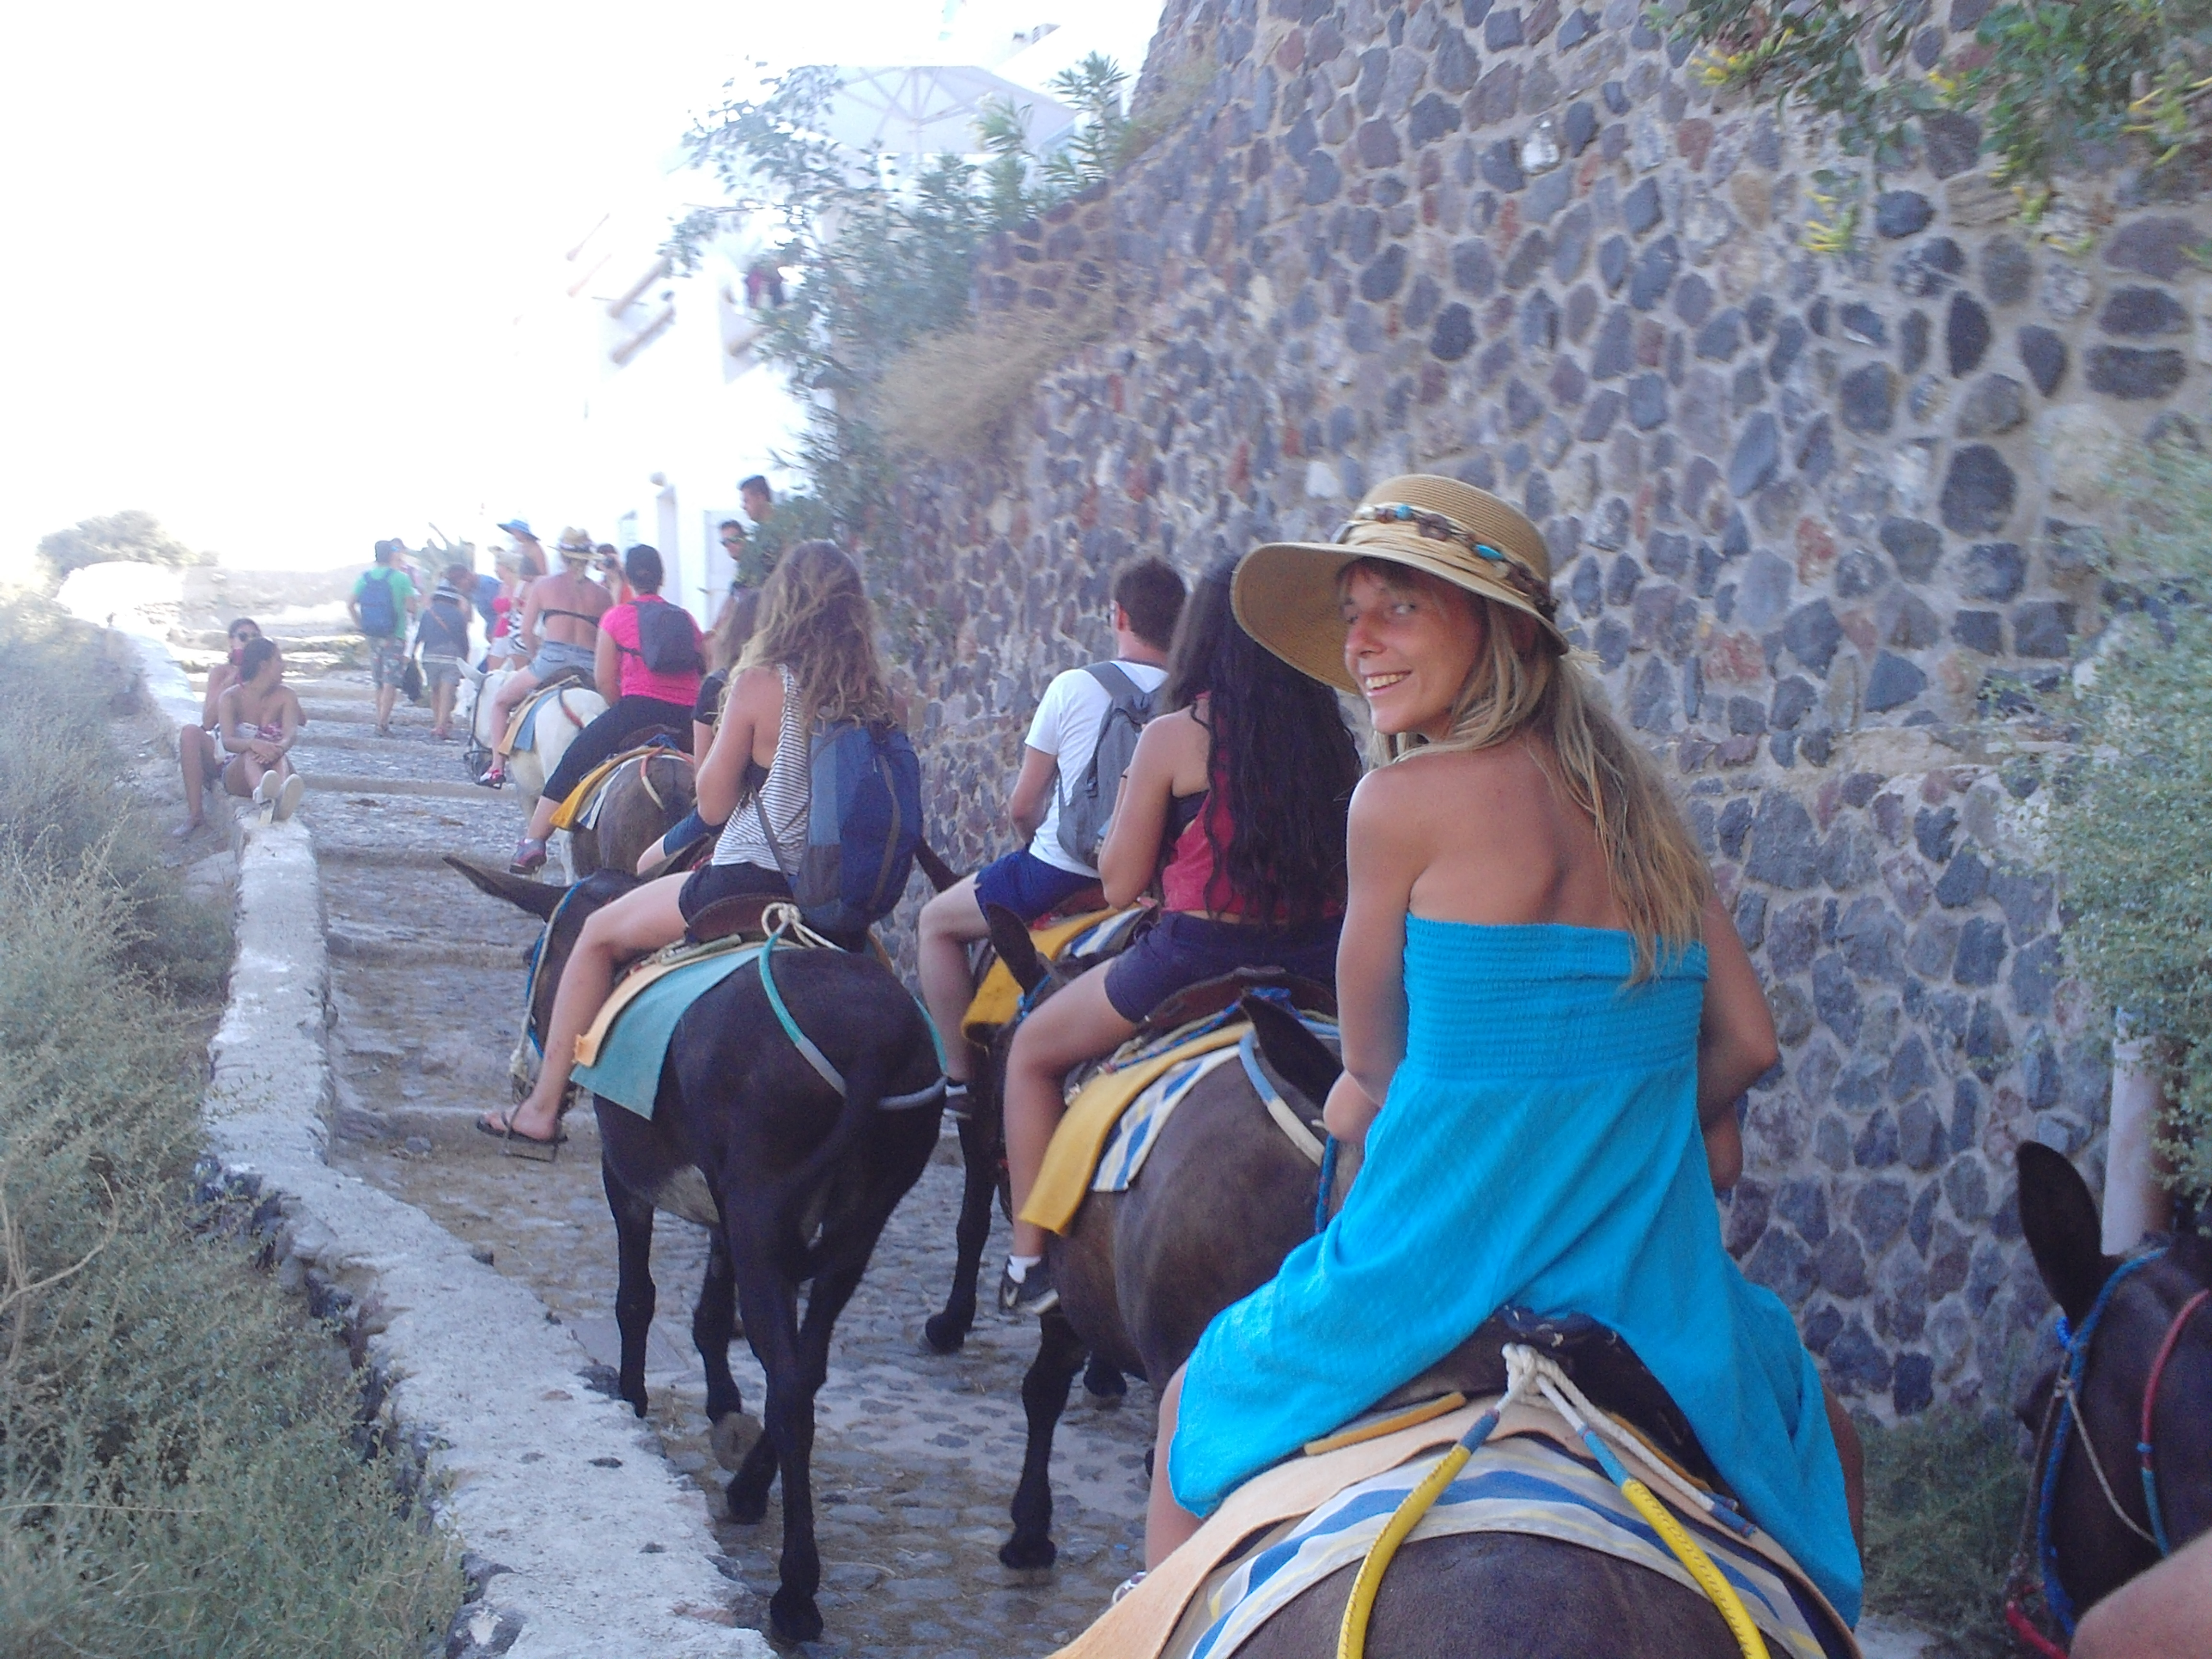 17. Riding donkeys on the way upstairs to Oia - Santorini